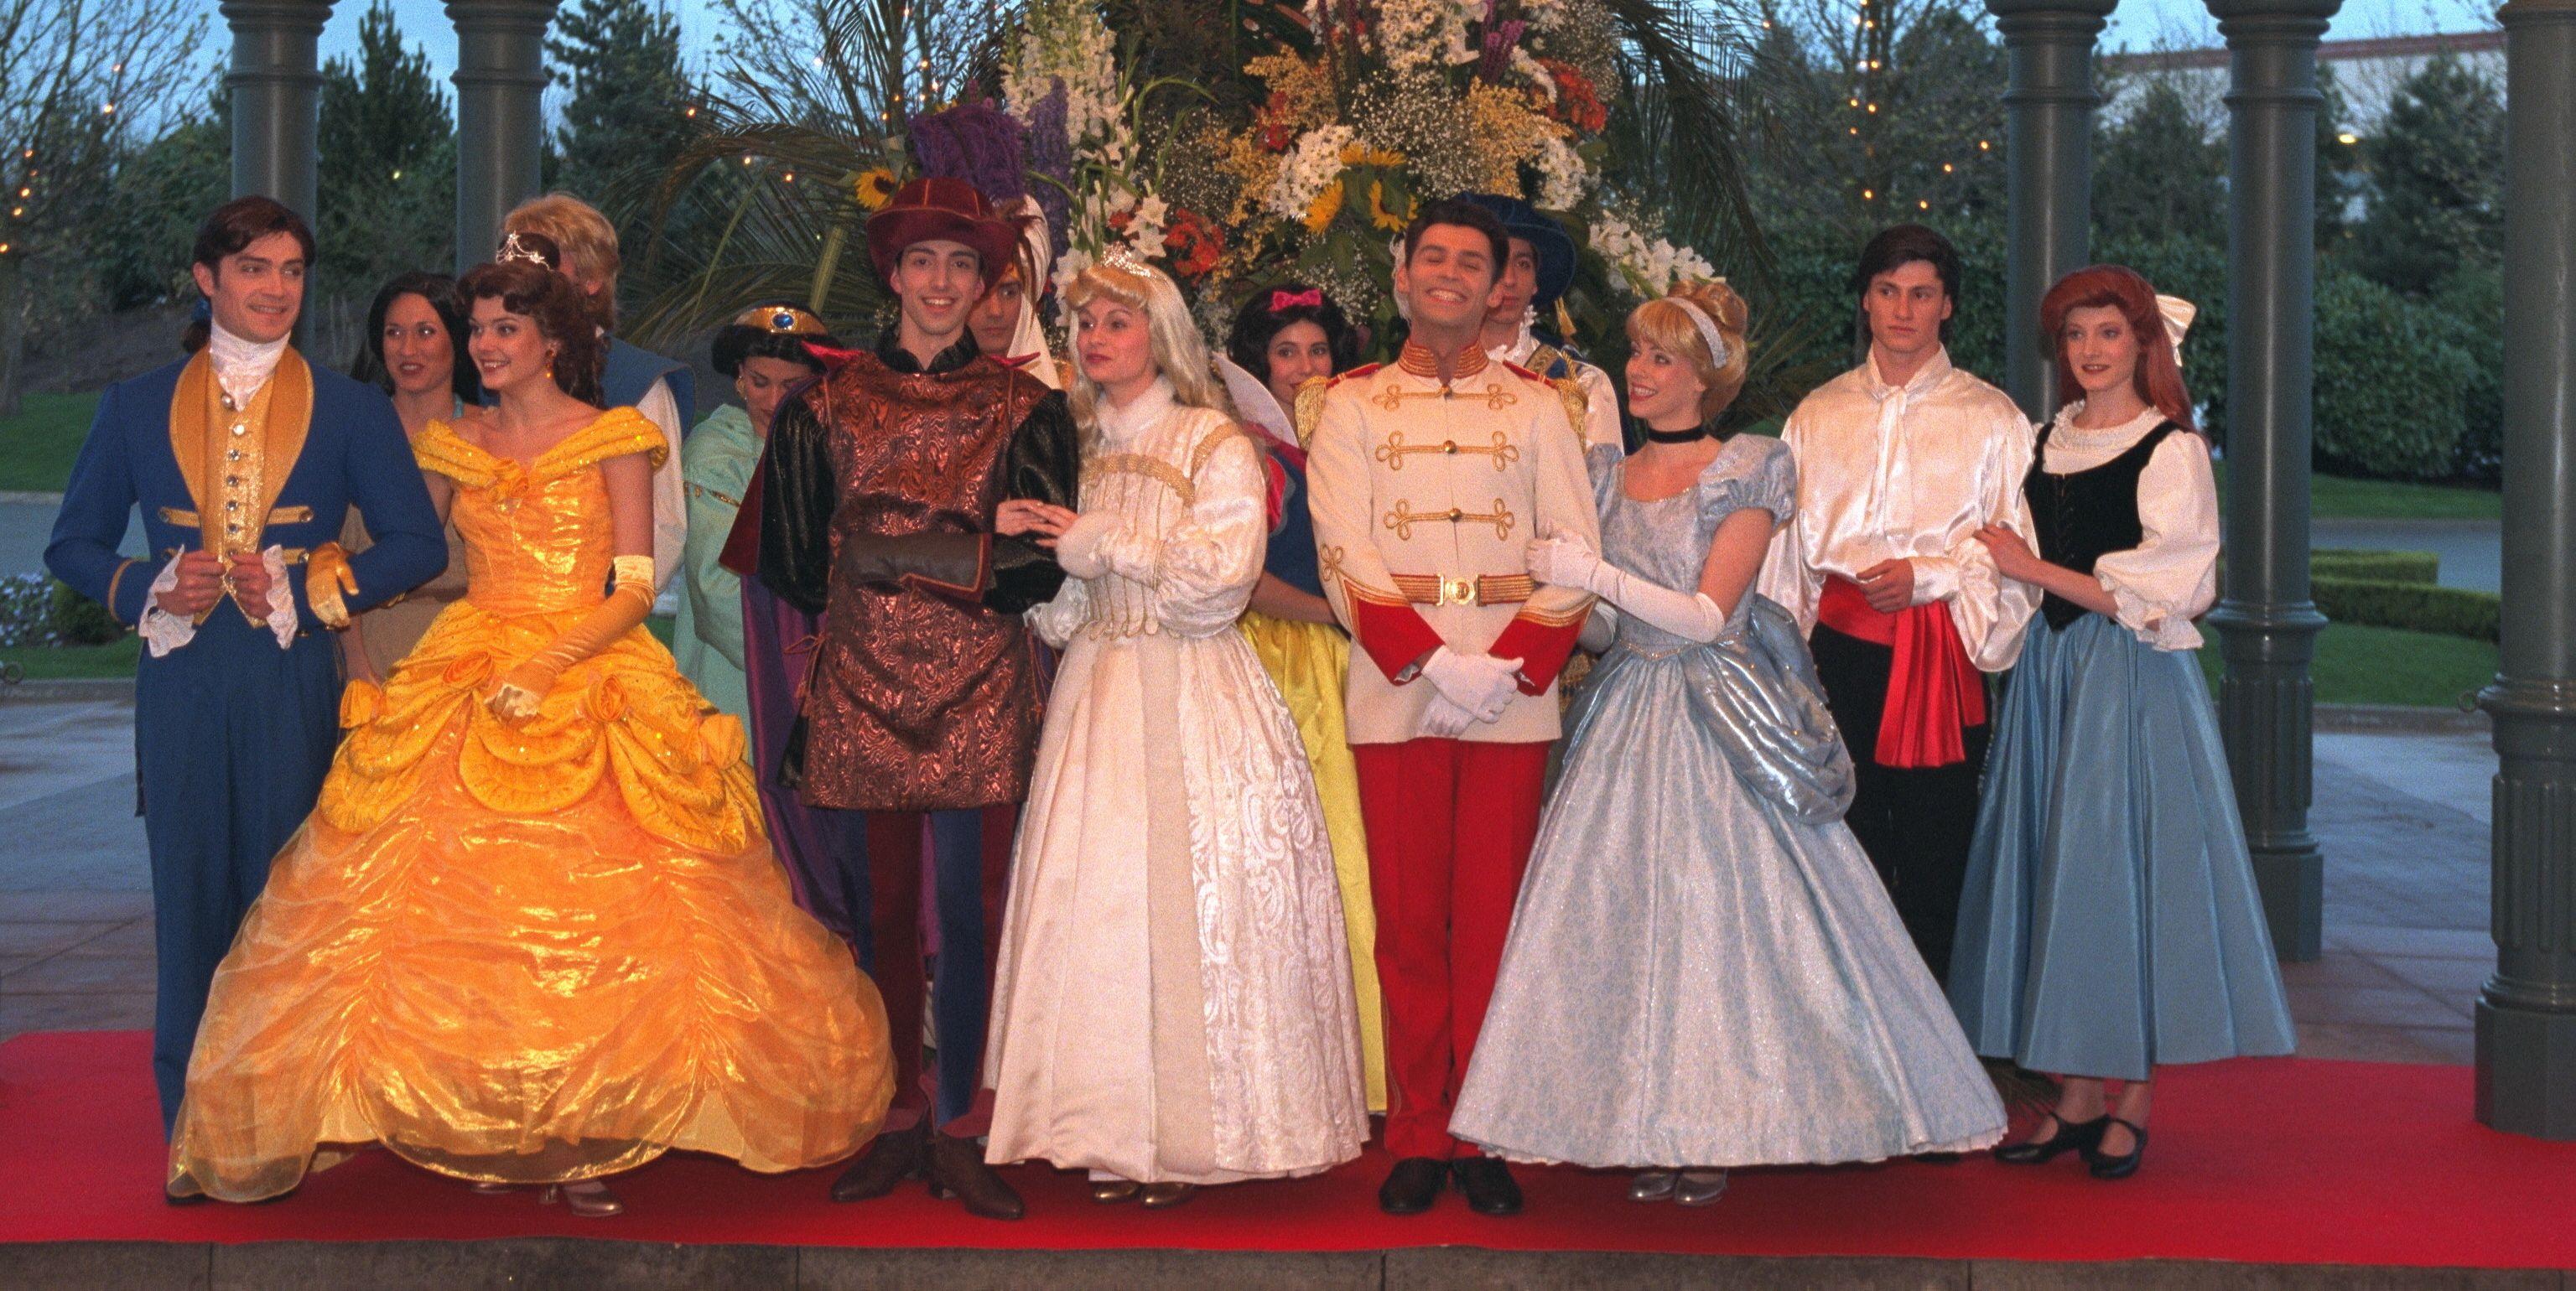 Princess, Prince, Belle, Cinderella